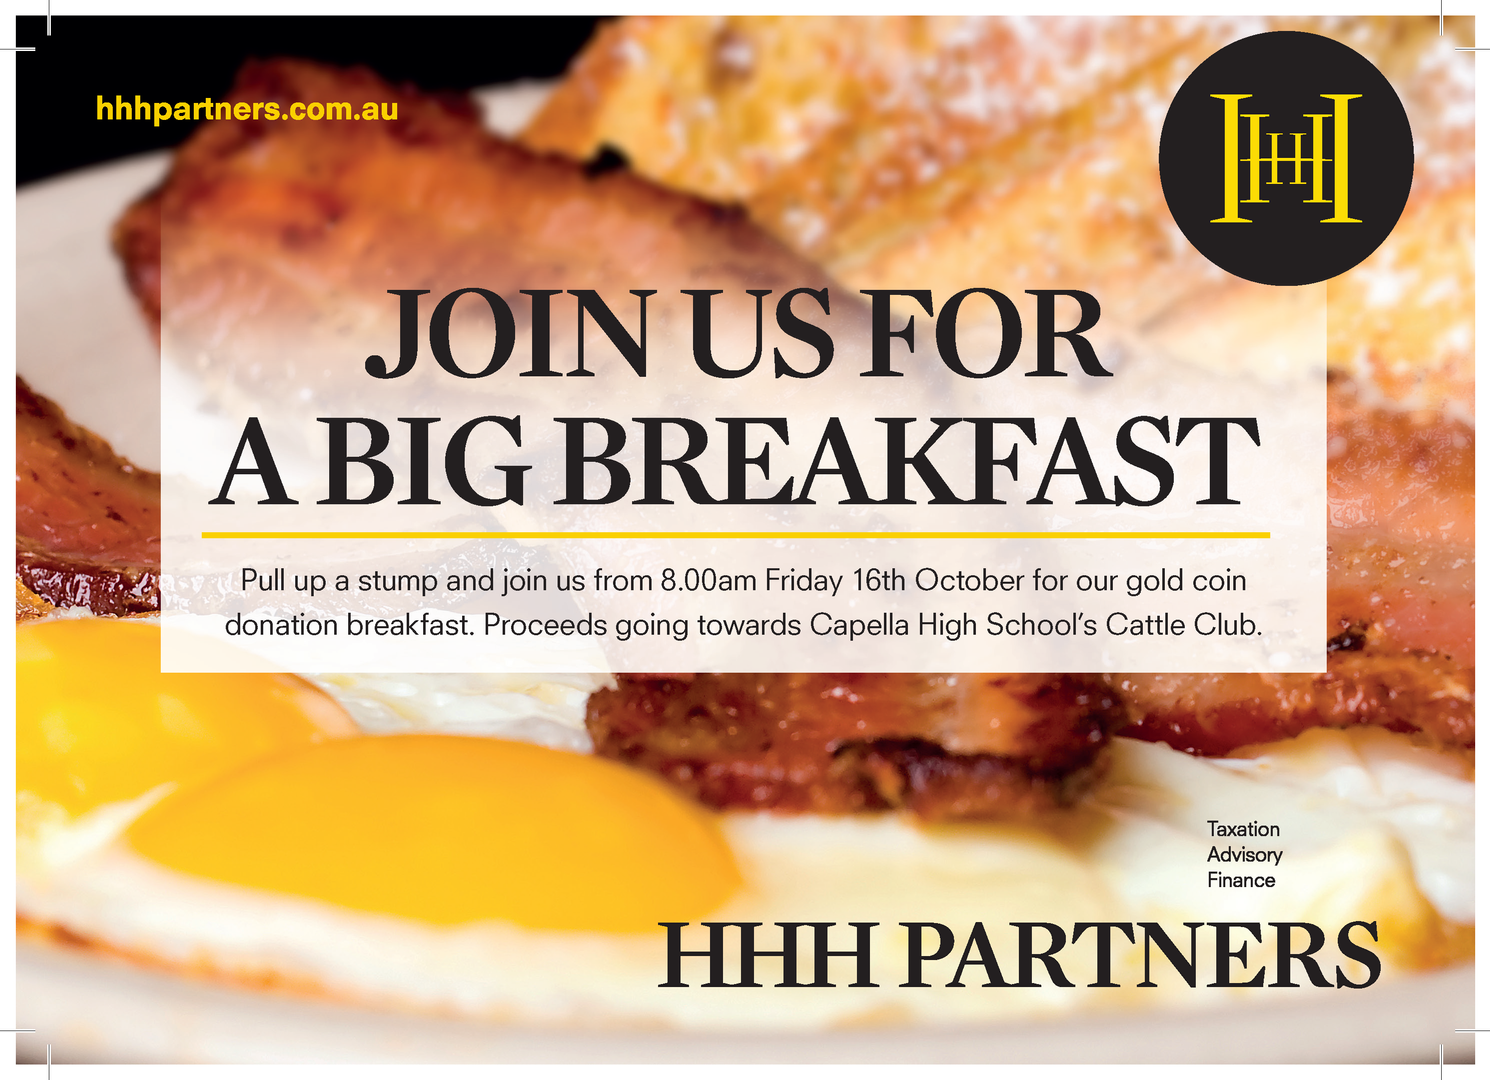 HHH Partners